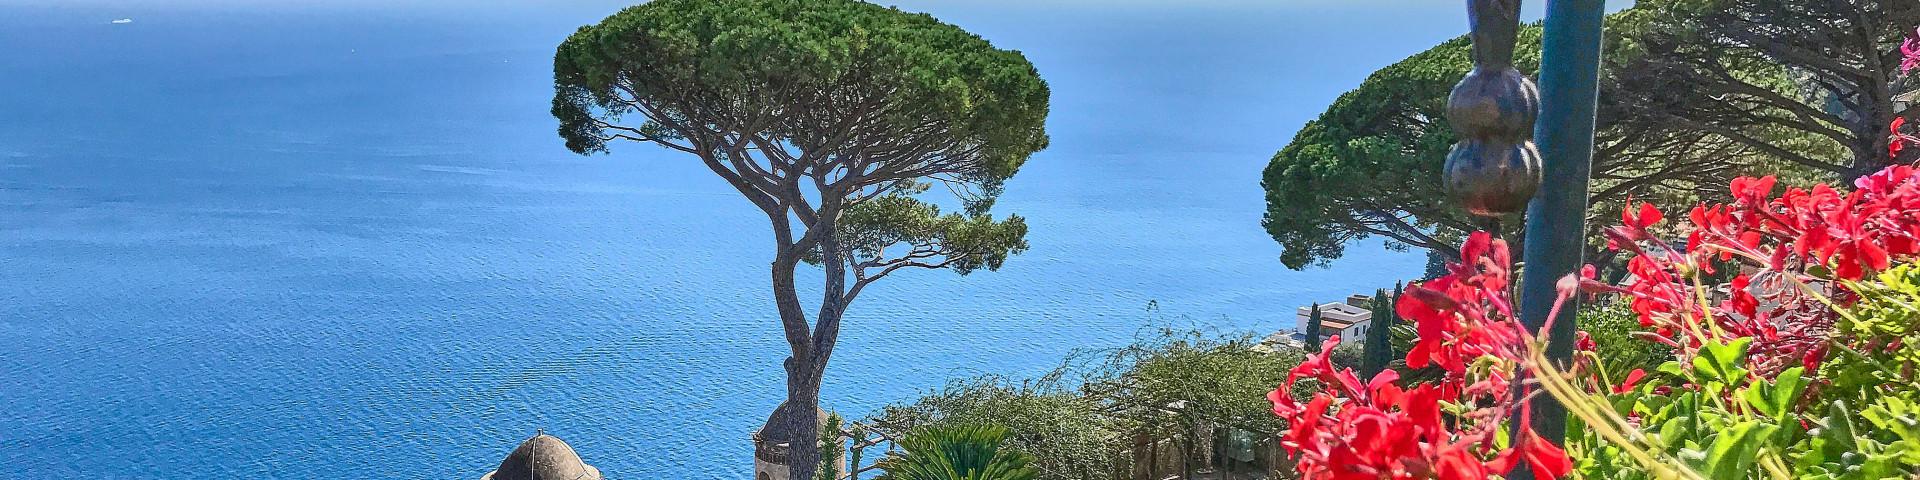 The magnificent garden in Villa Rufolo